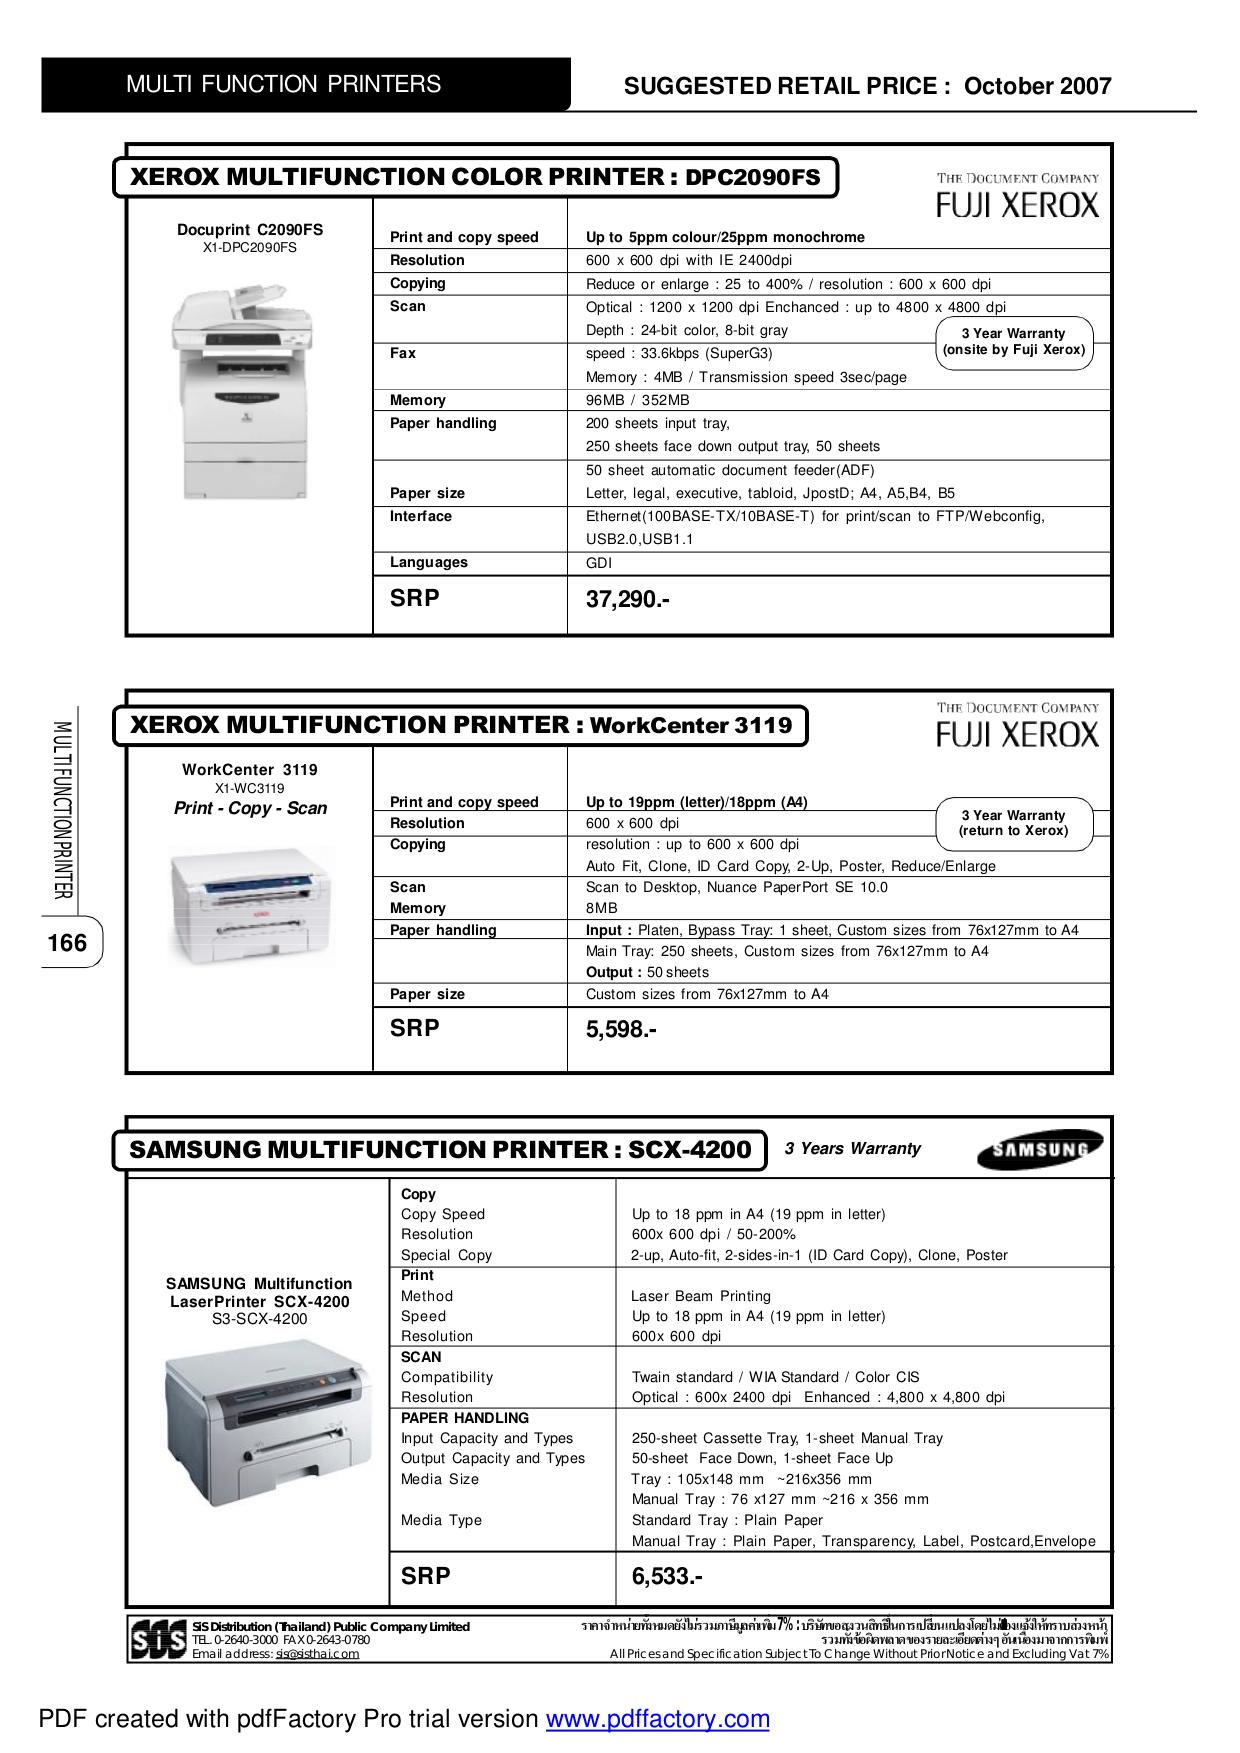 pdf for Samsung Multifunction Printer SCX-1100 manual